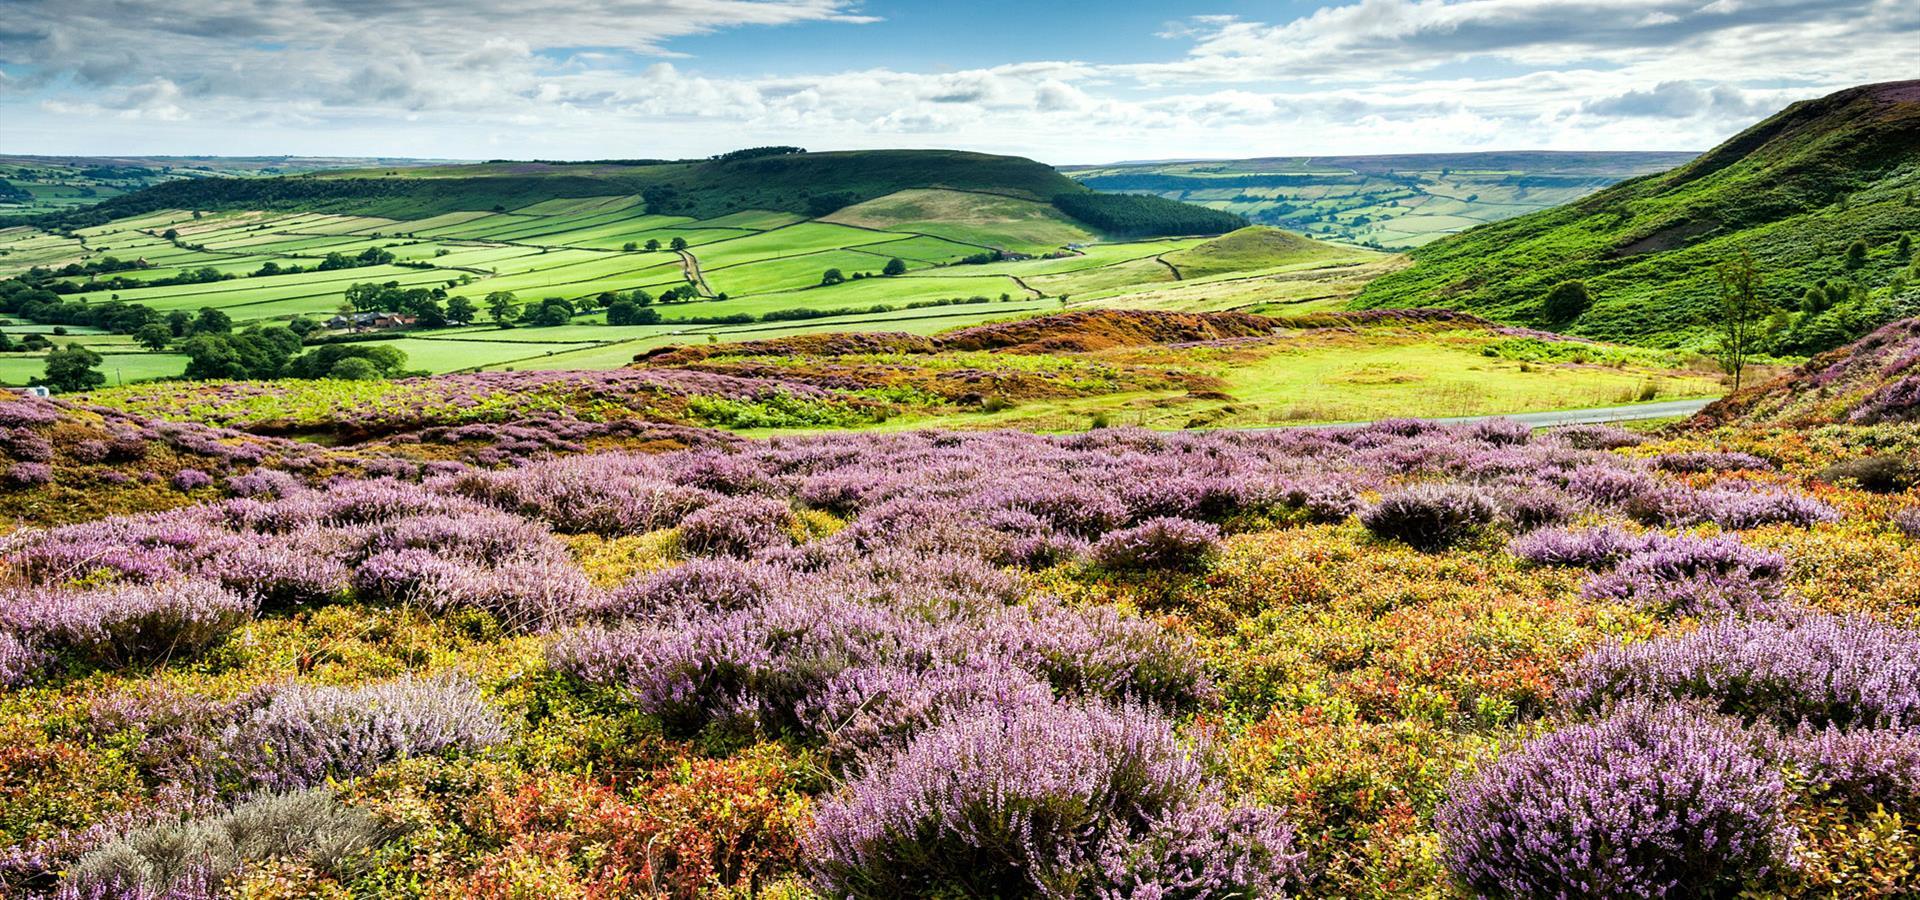 An image of the North York Moors - By Richard Burdon